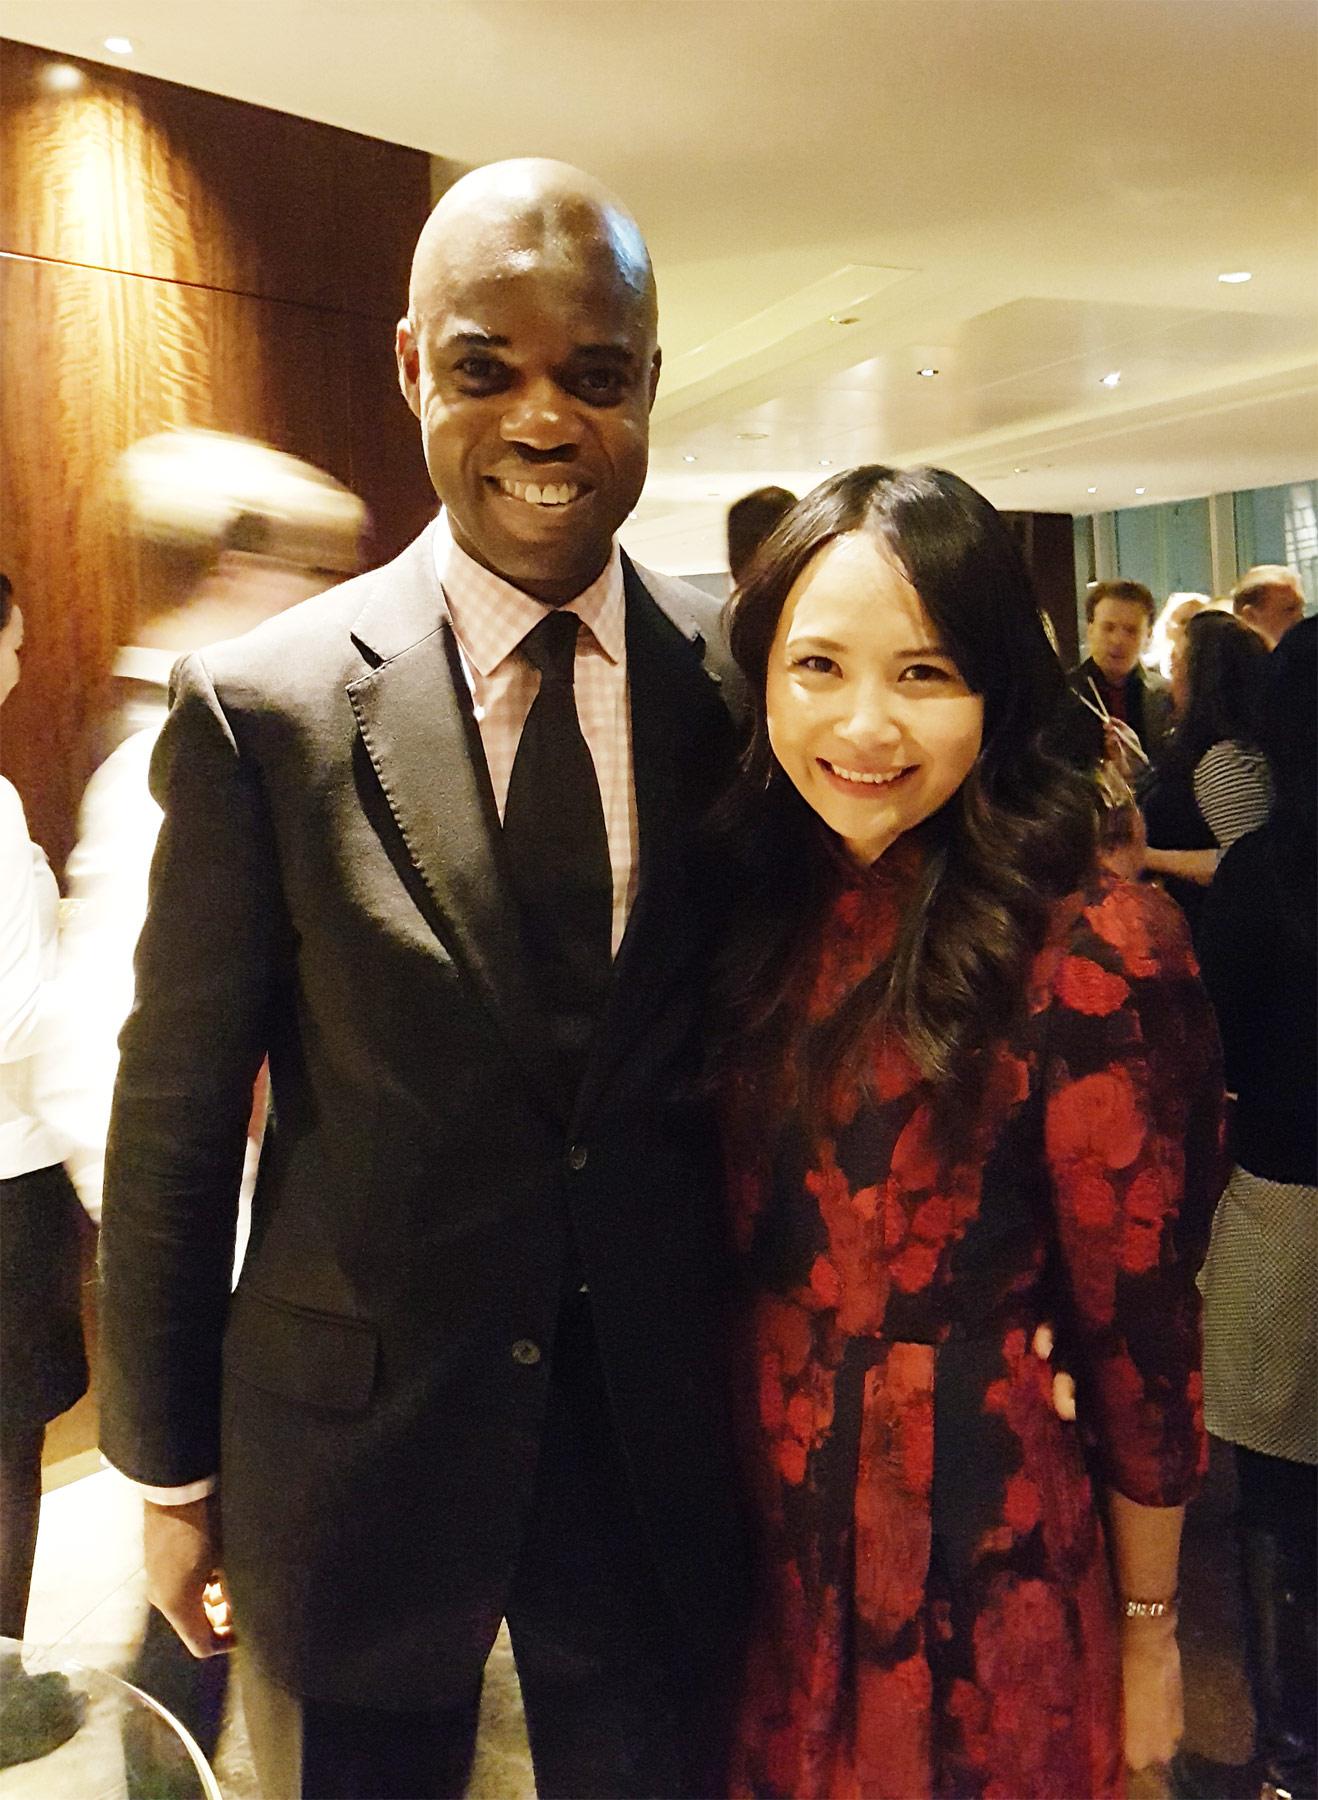 Jamie Ndah and Chef Ching He Huang